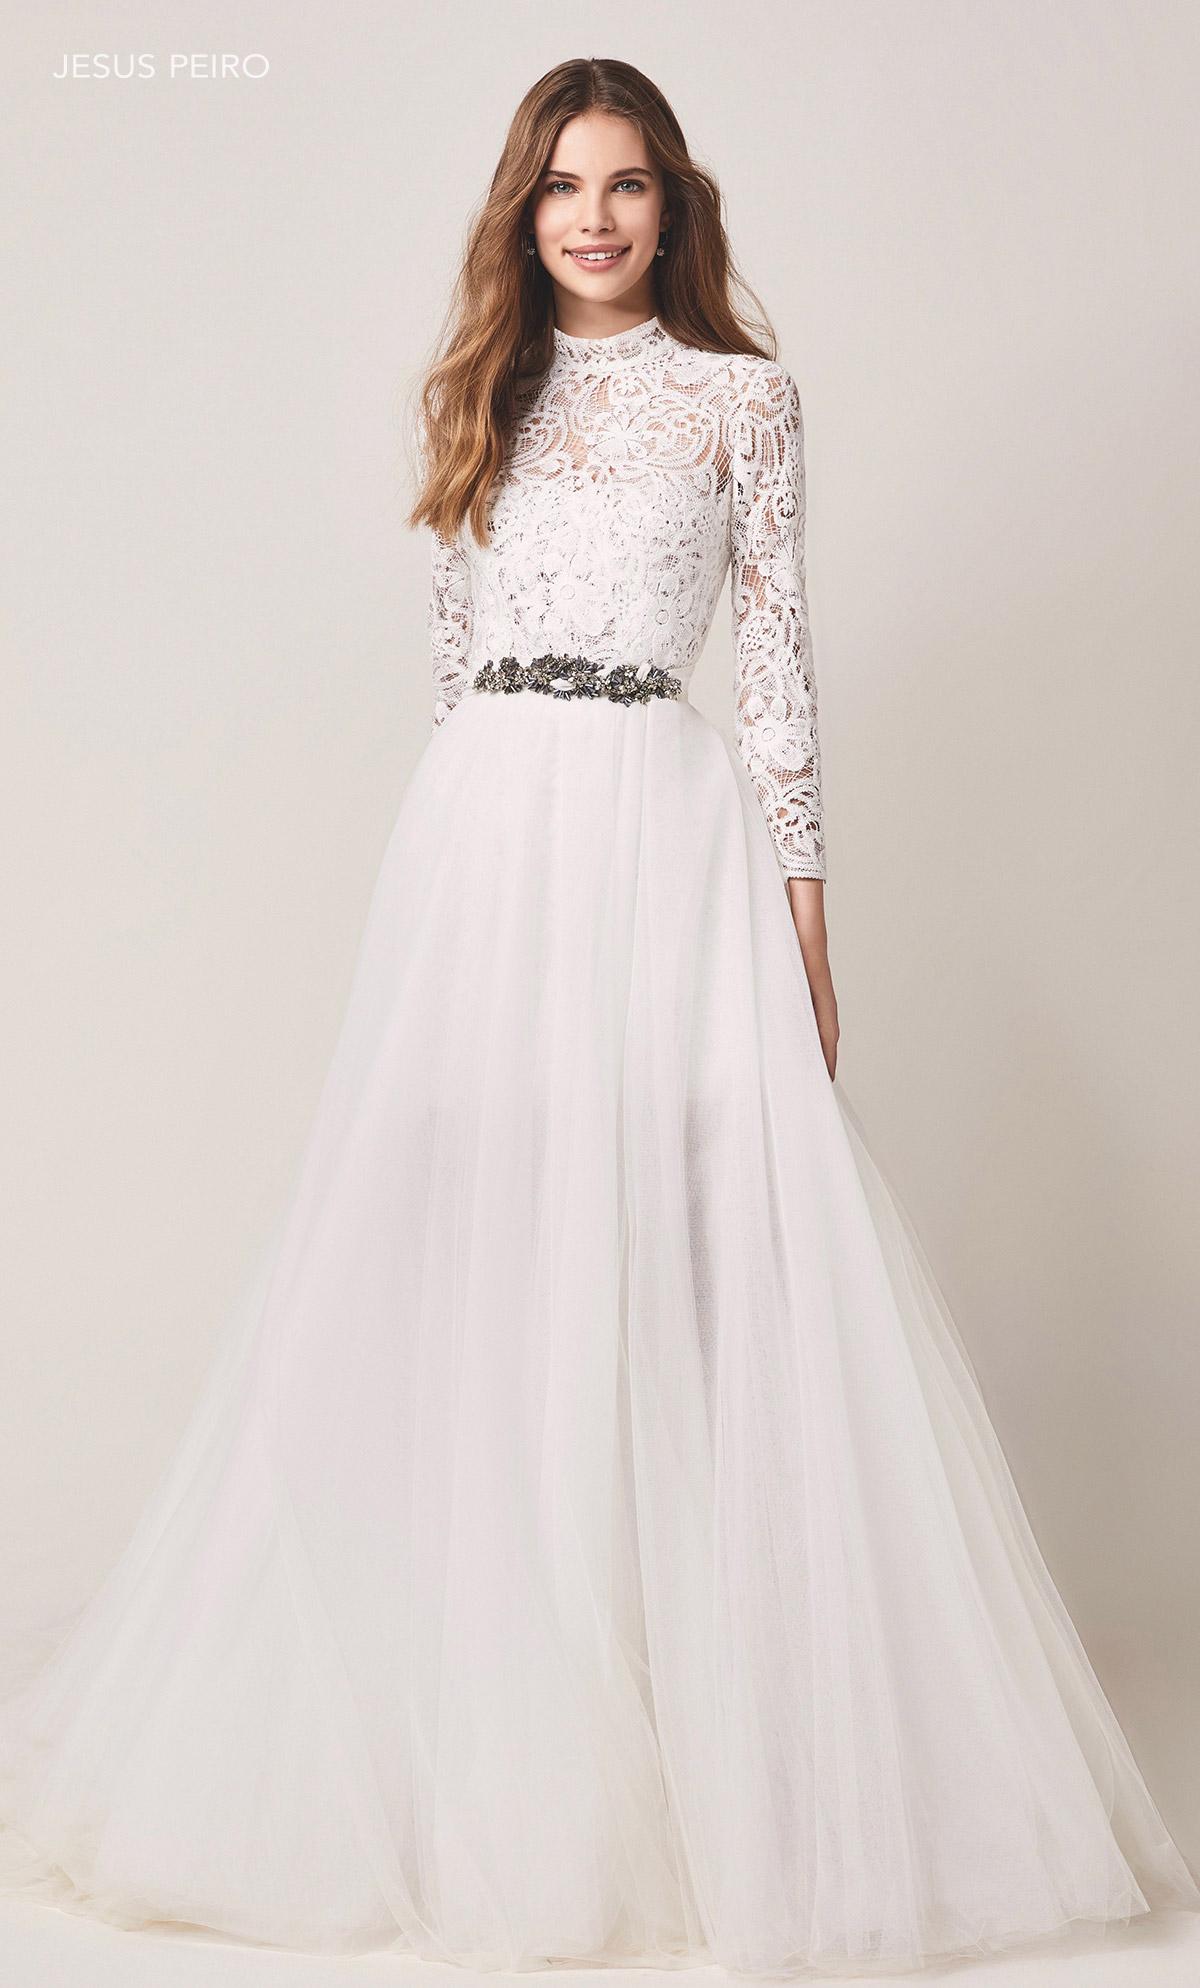 Jesus Peiró lace wedding dress